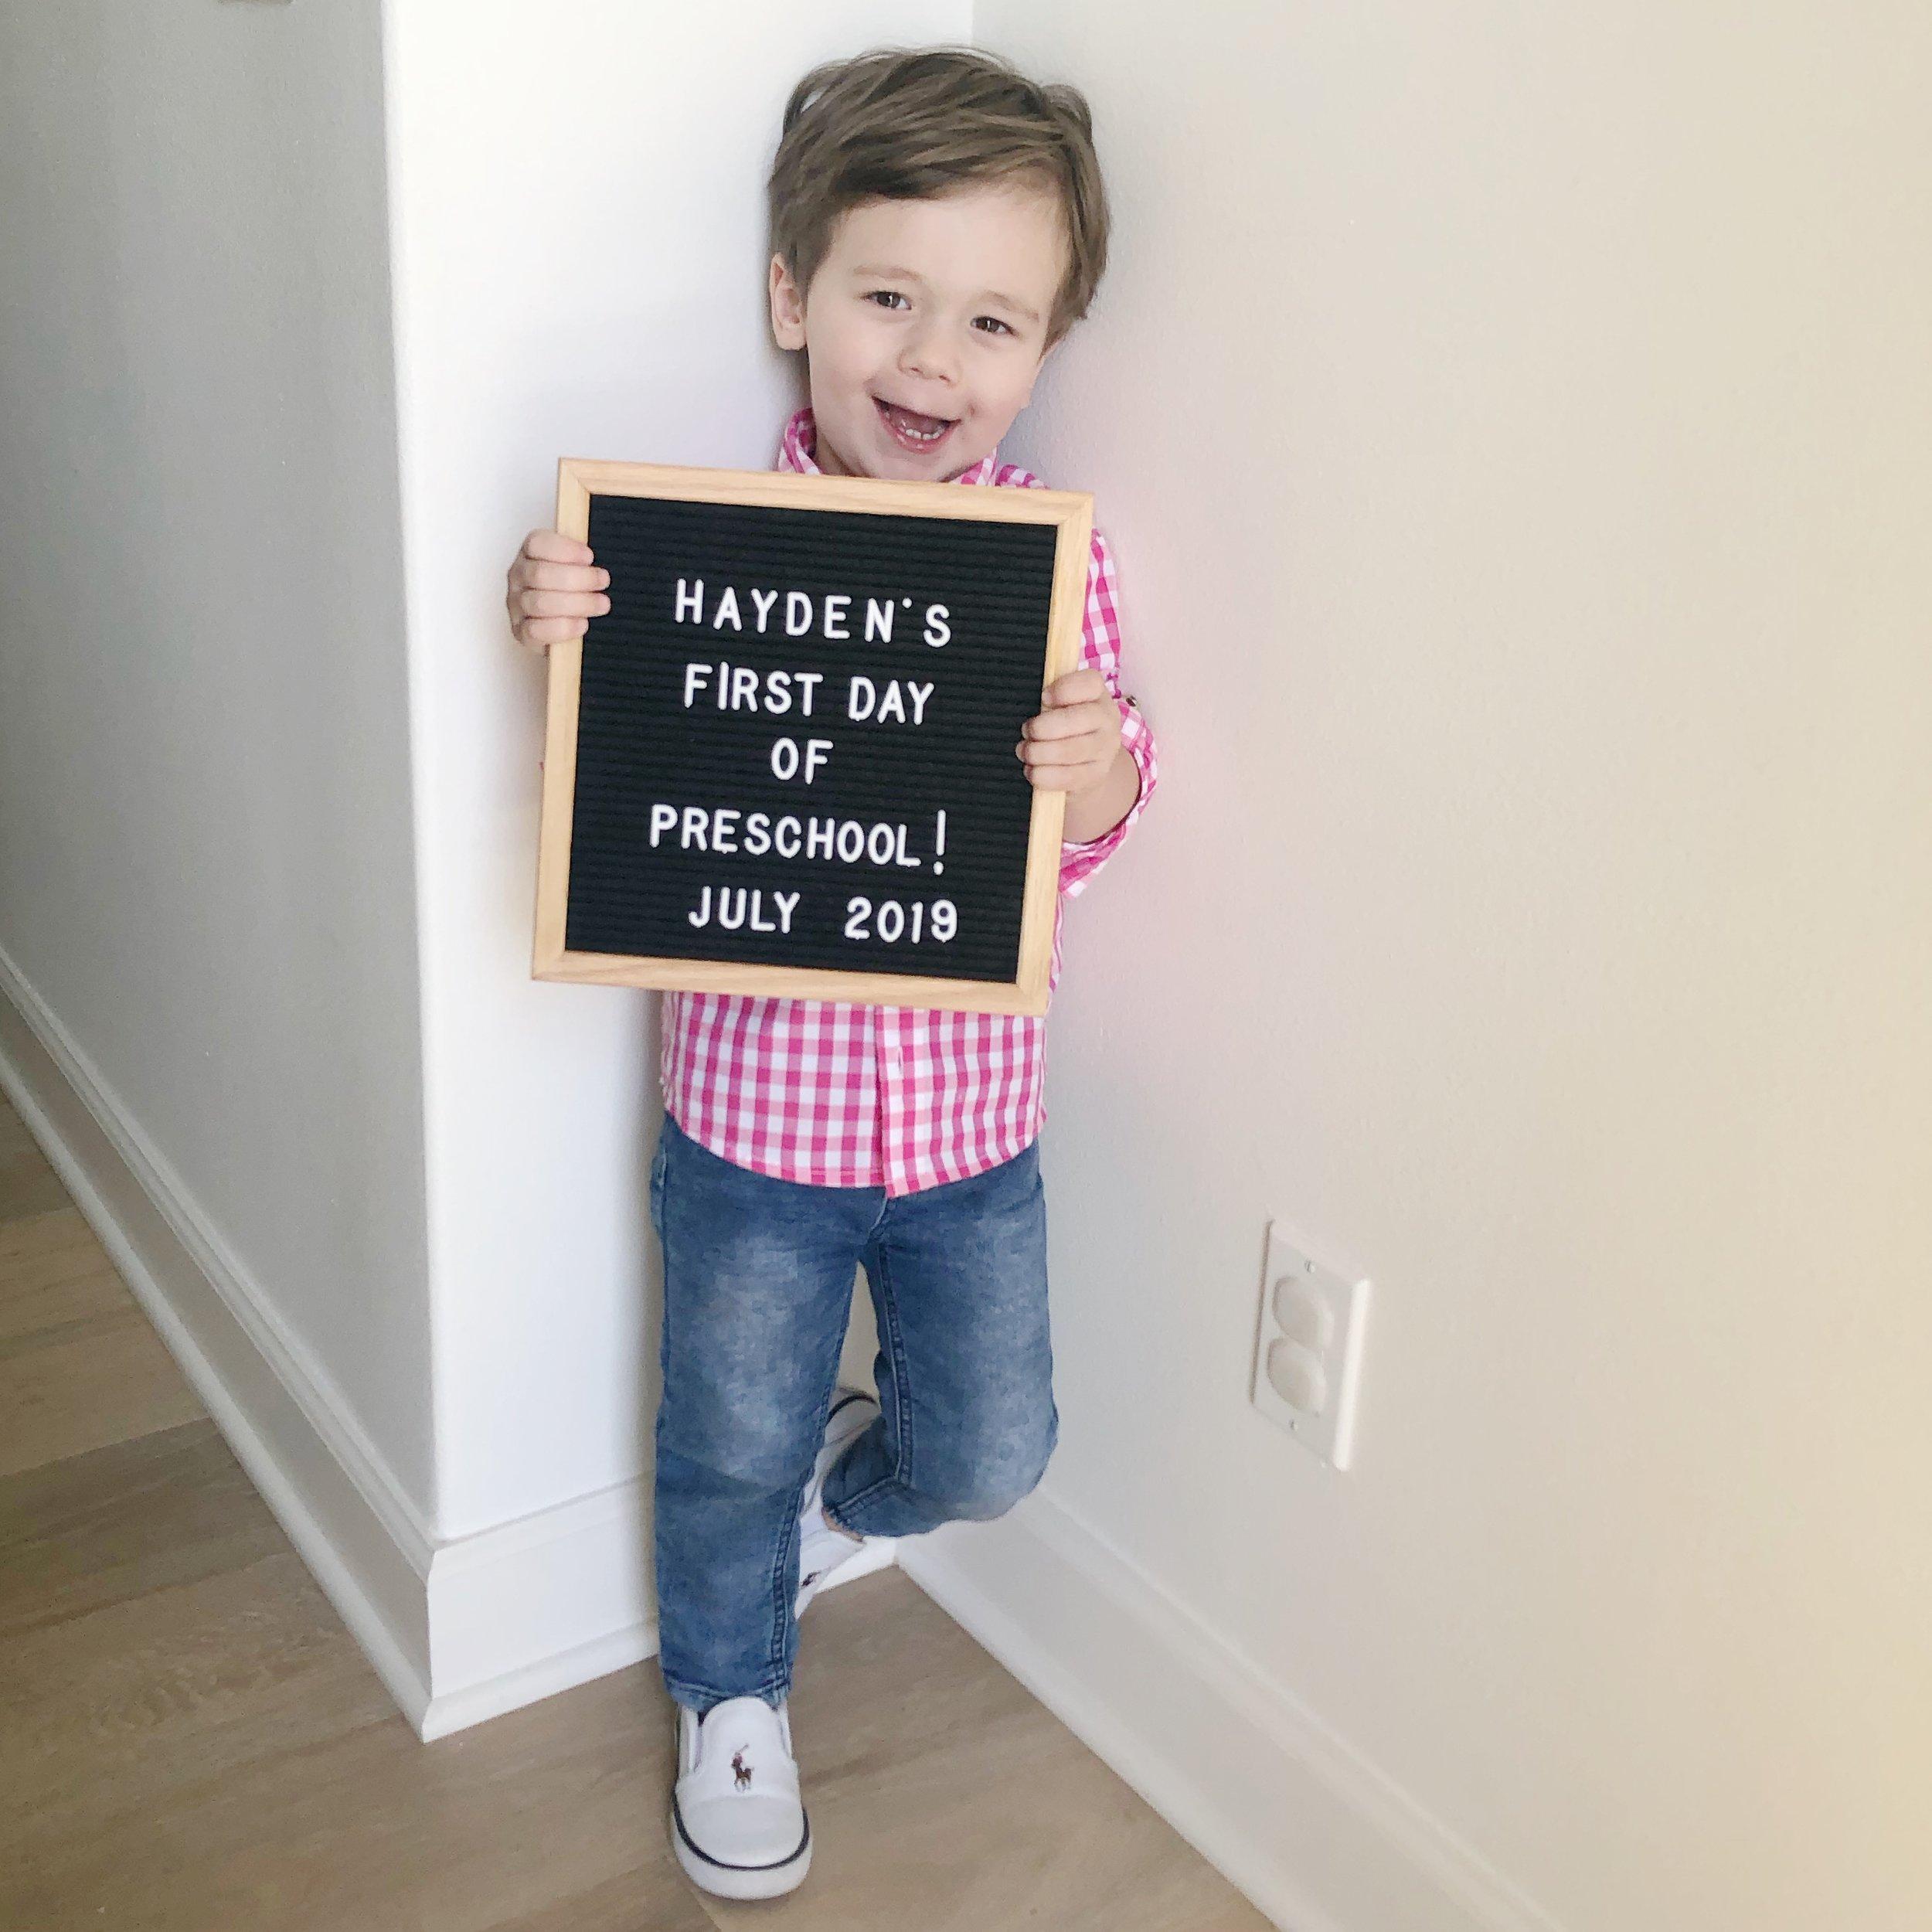 Hayden first day of school.JPG